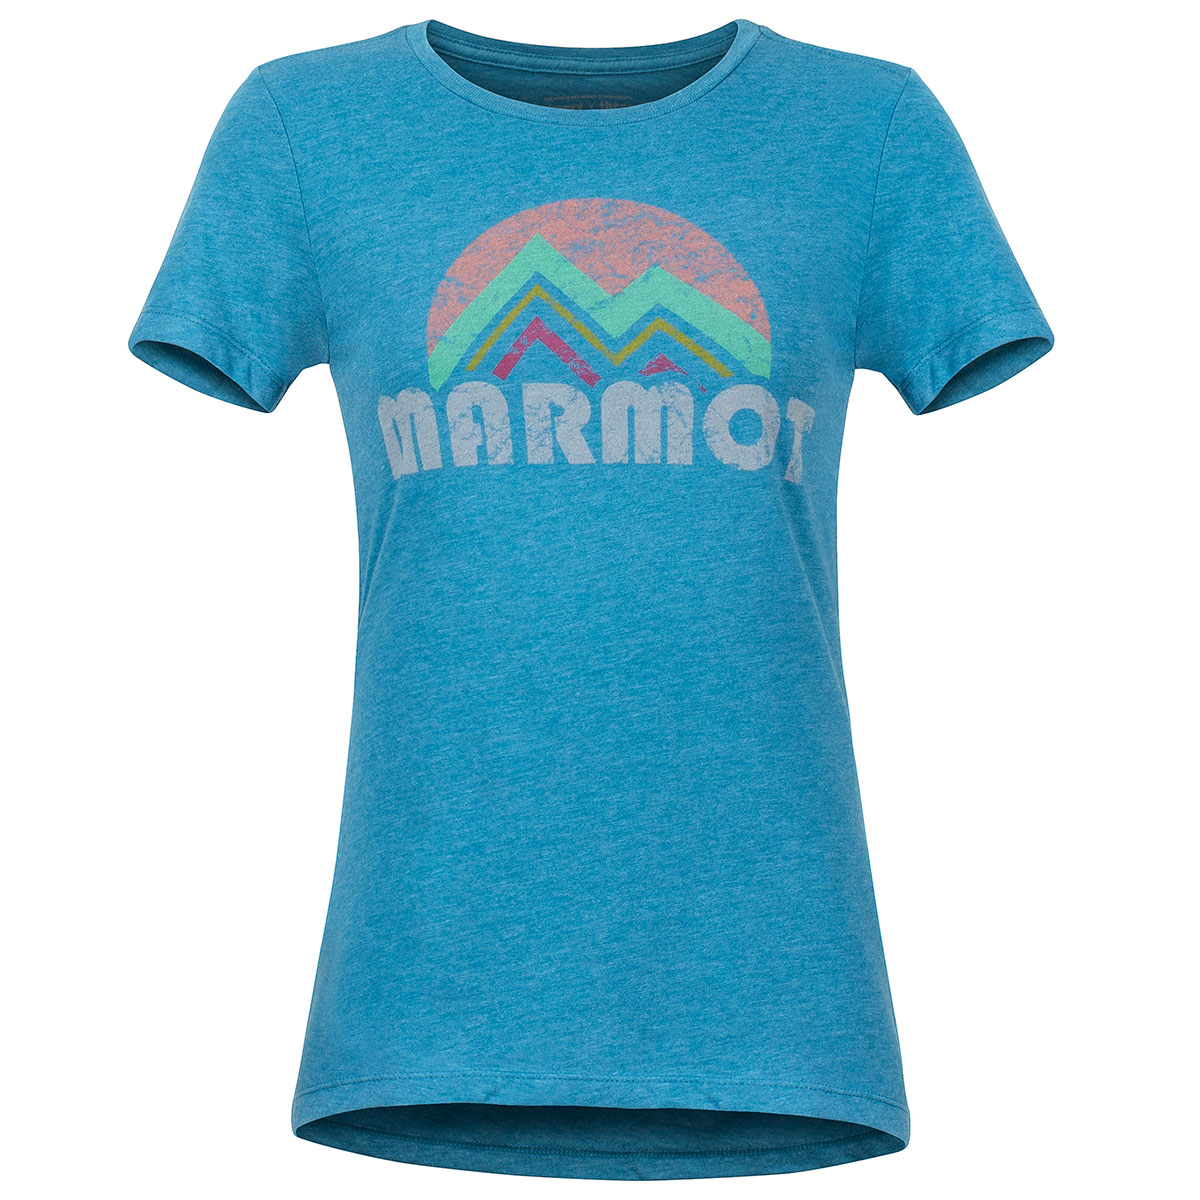 Marmot Women's Reyes Short-Sleeve Tee - Blue, M